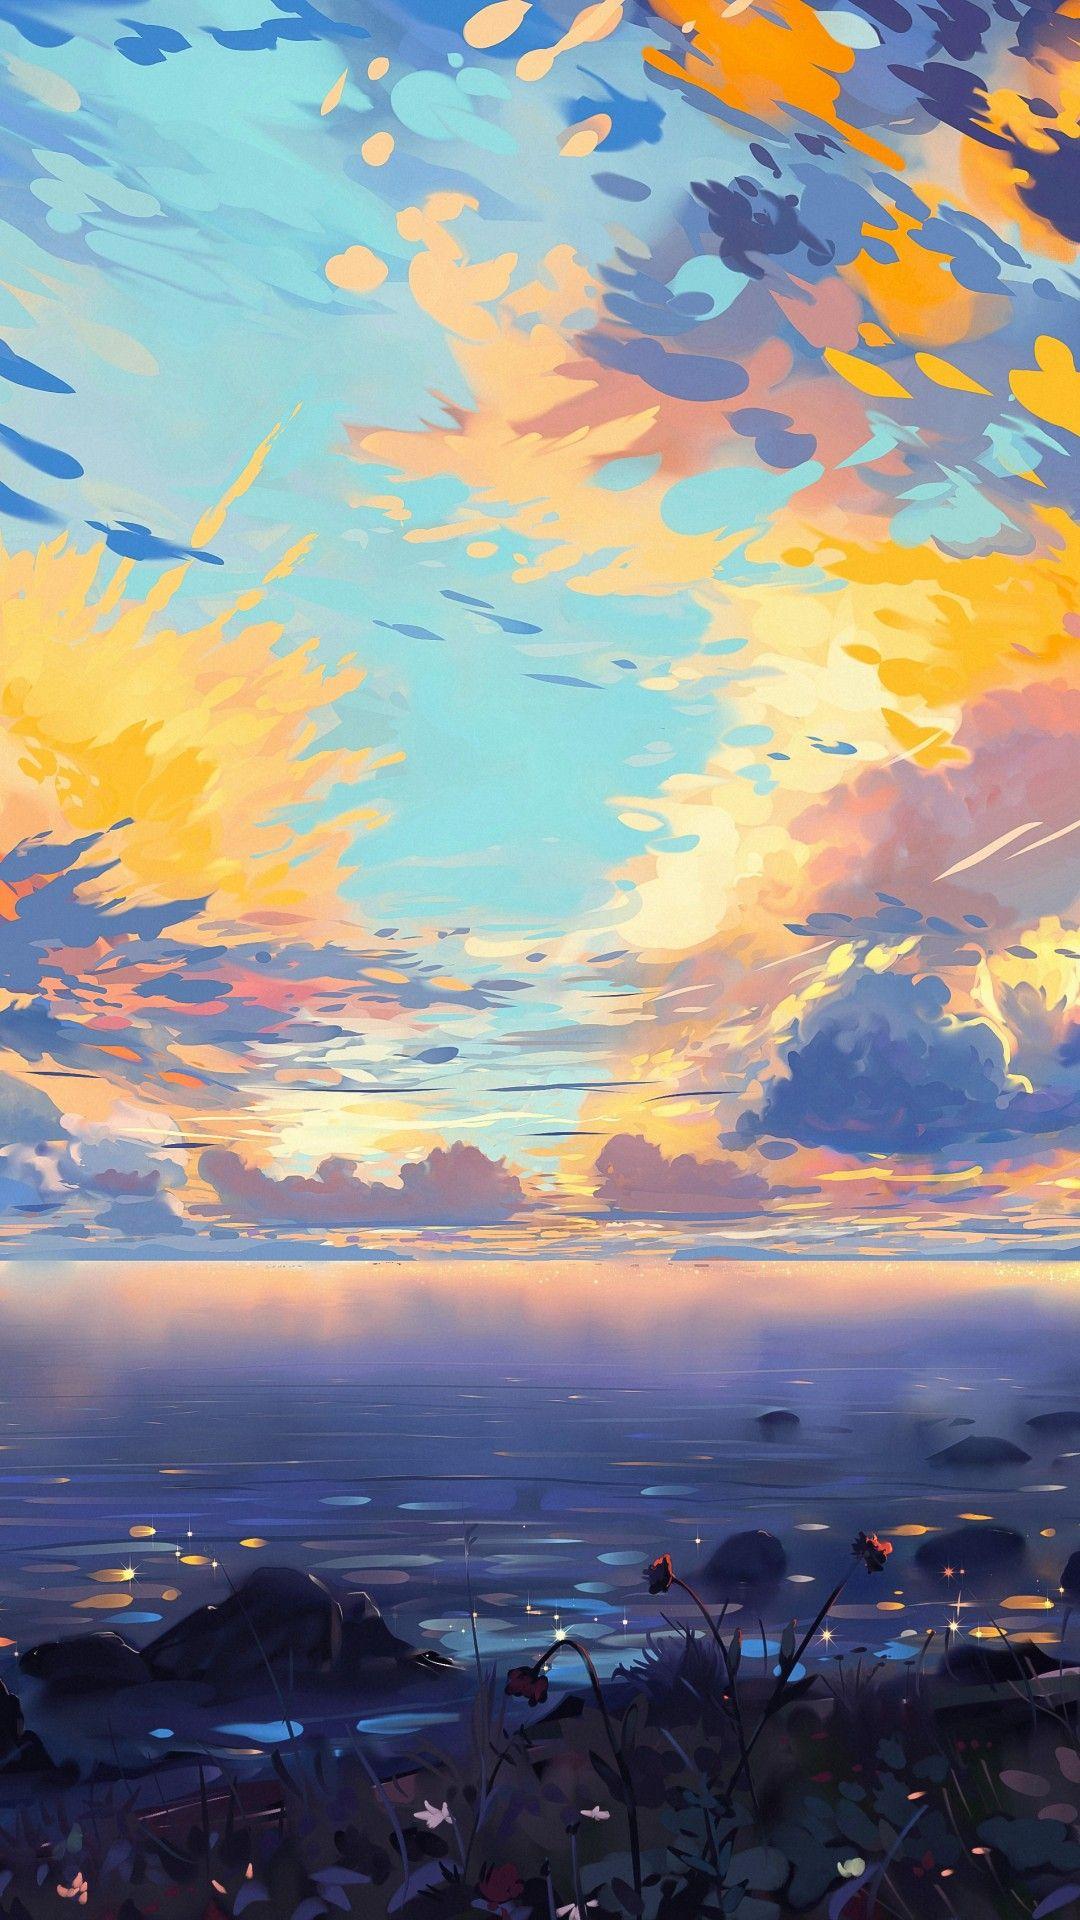 Anime Landscape Sea Ships Colorful Clouds Scenic Tree Horizon Scenery Wallpaper Landscape Wallpaper Anime Scenery Wallpaper Anime scenery wallpaper mobile